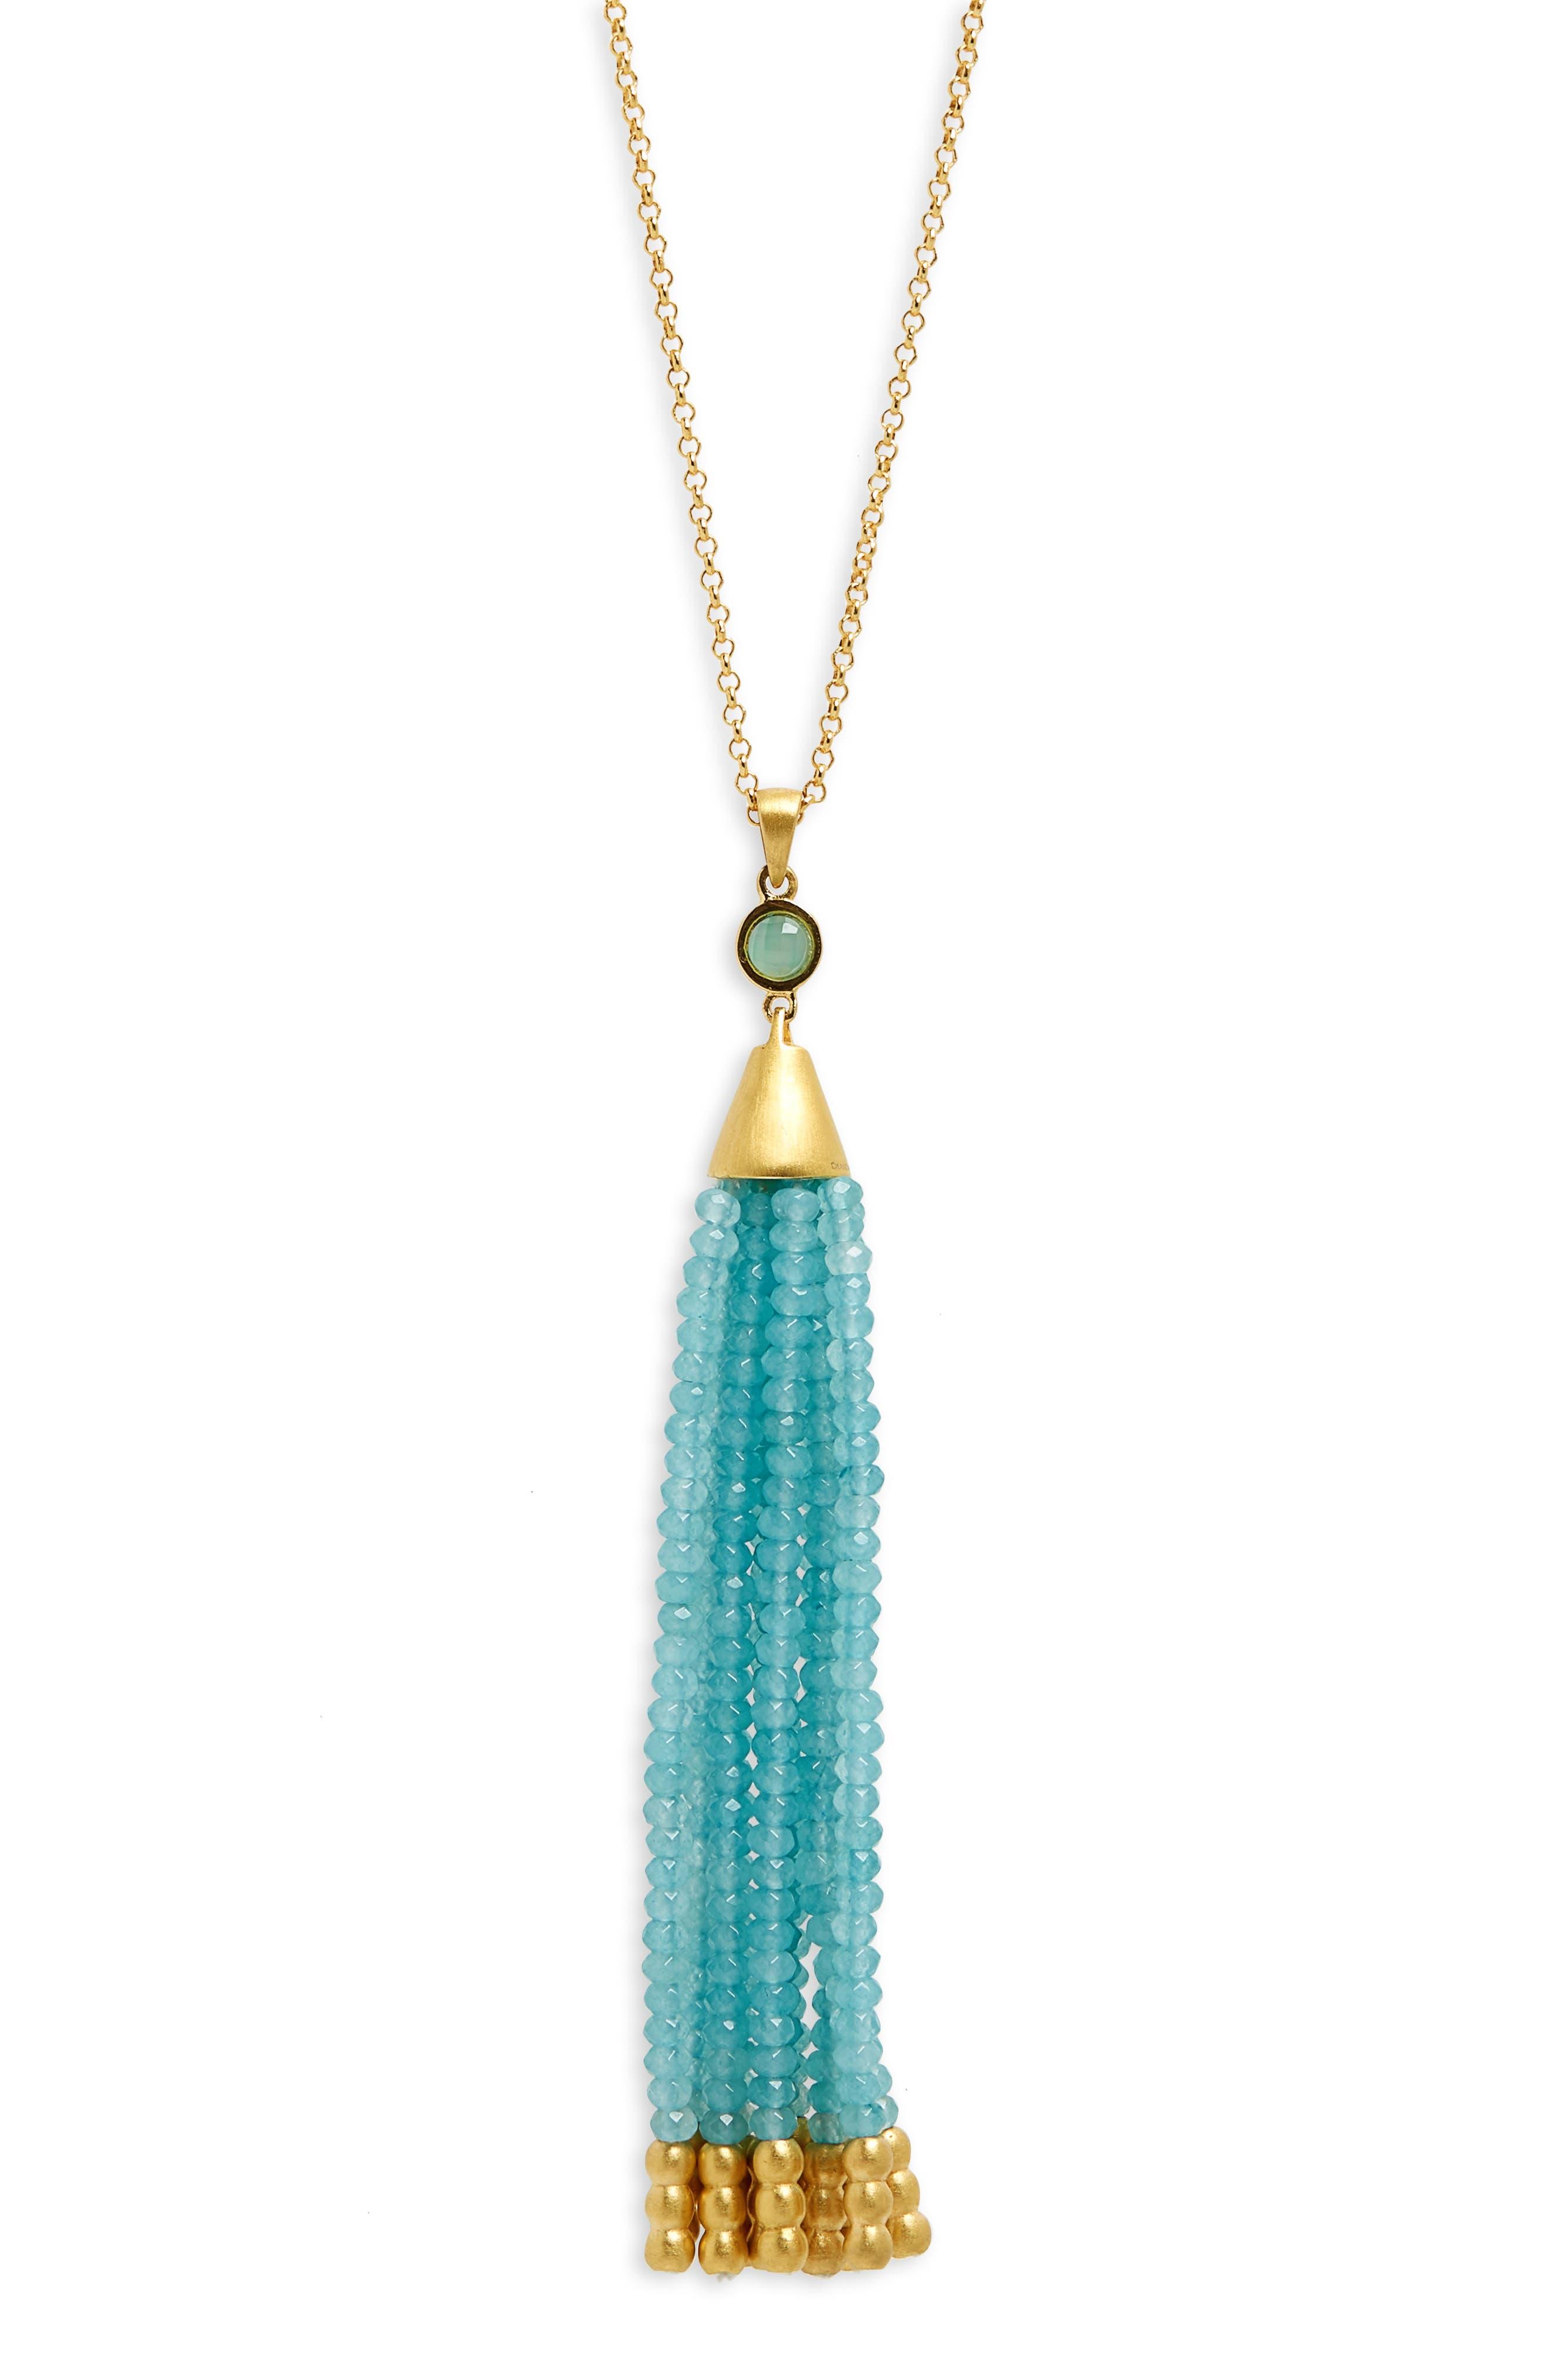 Samba Tassel Pendant Necklace,                             Alternate thumbnail 2, color,                             Ocean Blue Chalcedony/ Gold